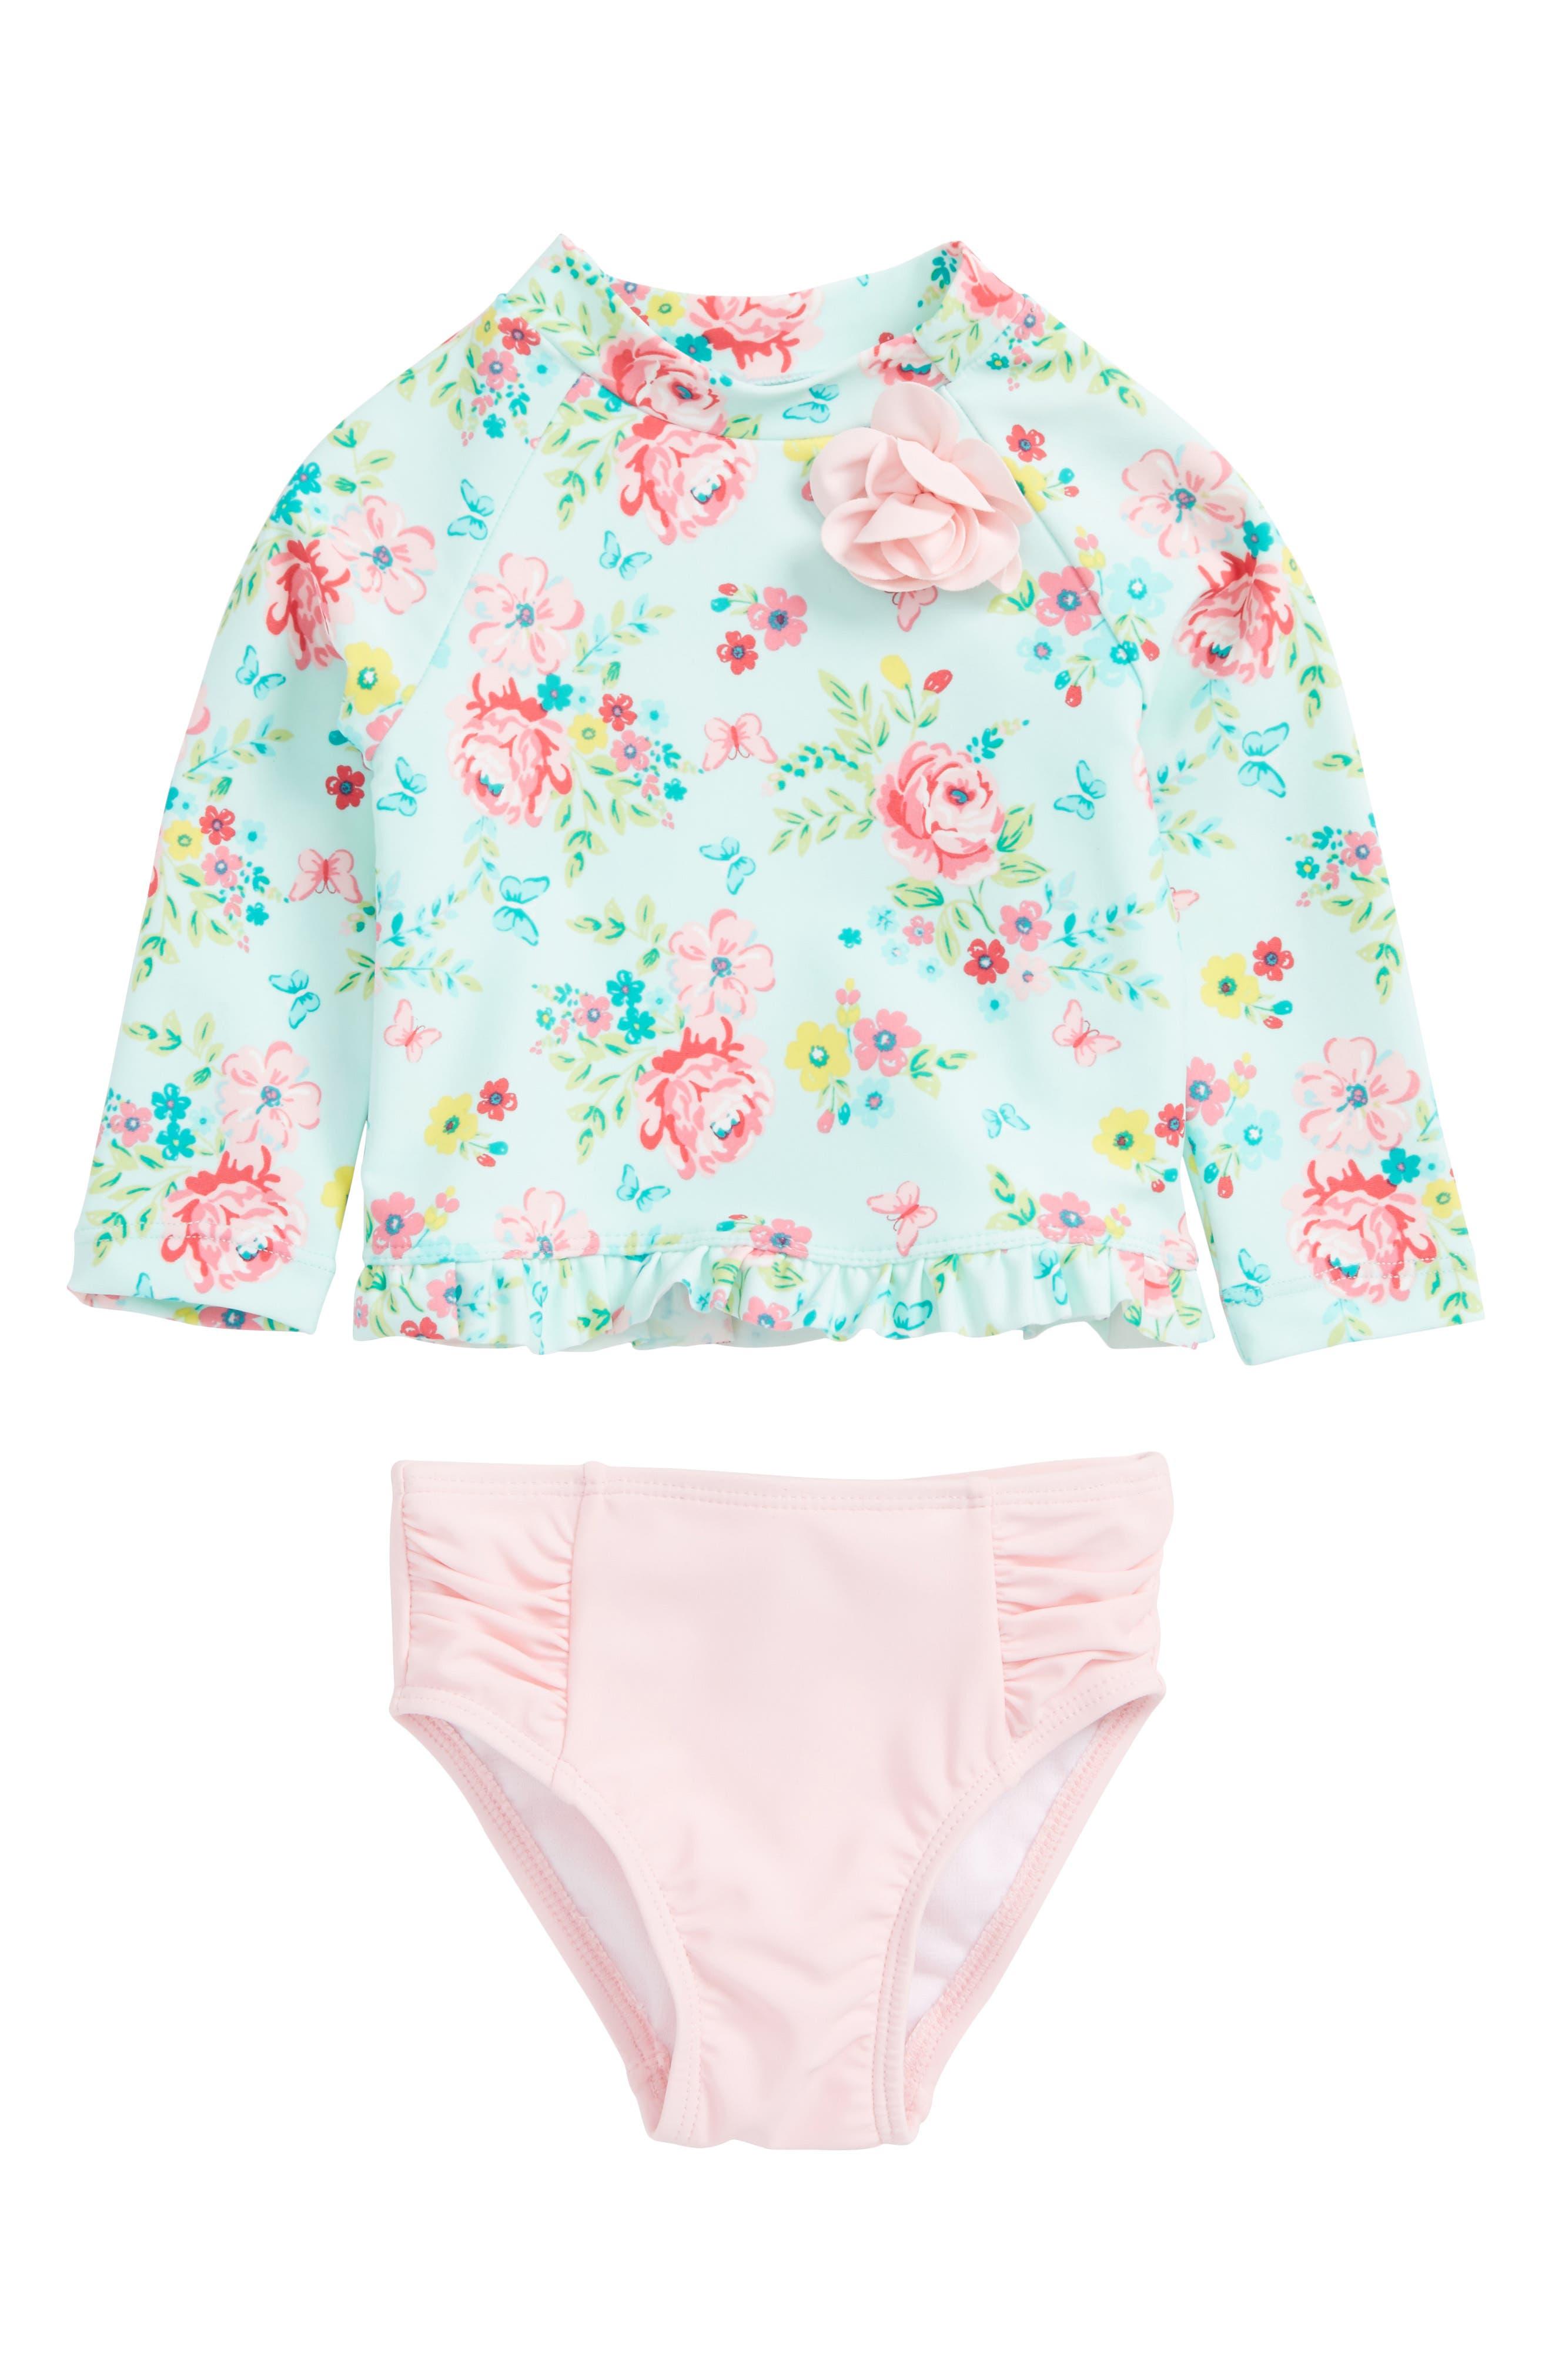 Alternate Image 1 Selected - Little Me Aqua Rose Two-Piece Rashguard Swimsuit (Baby Girls)